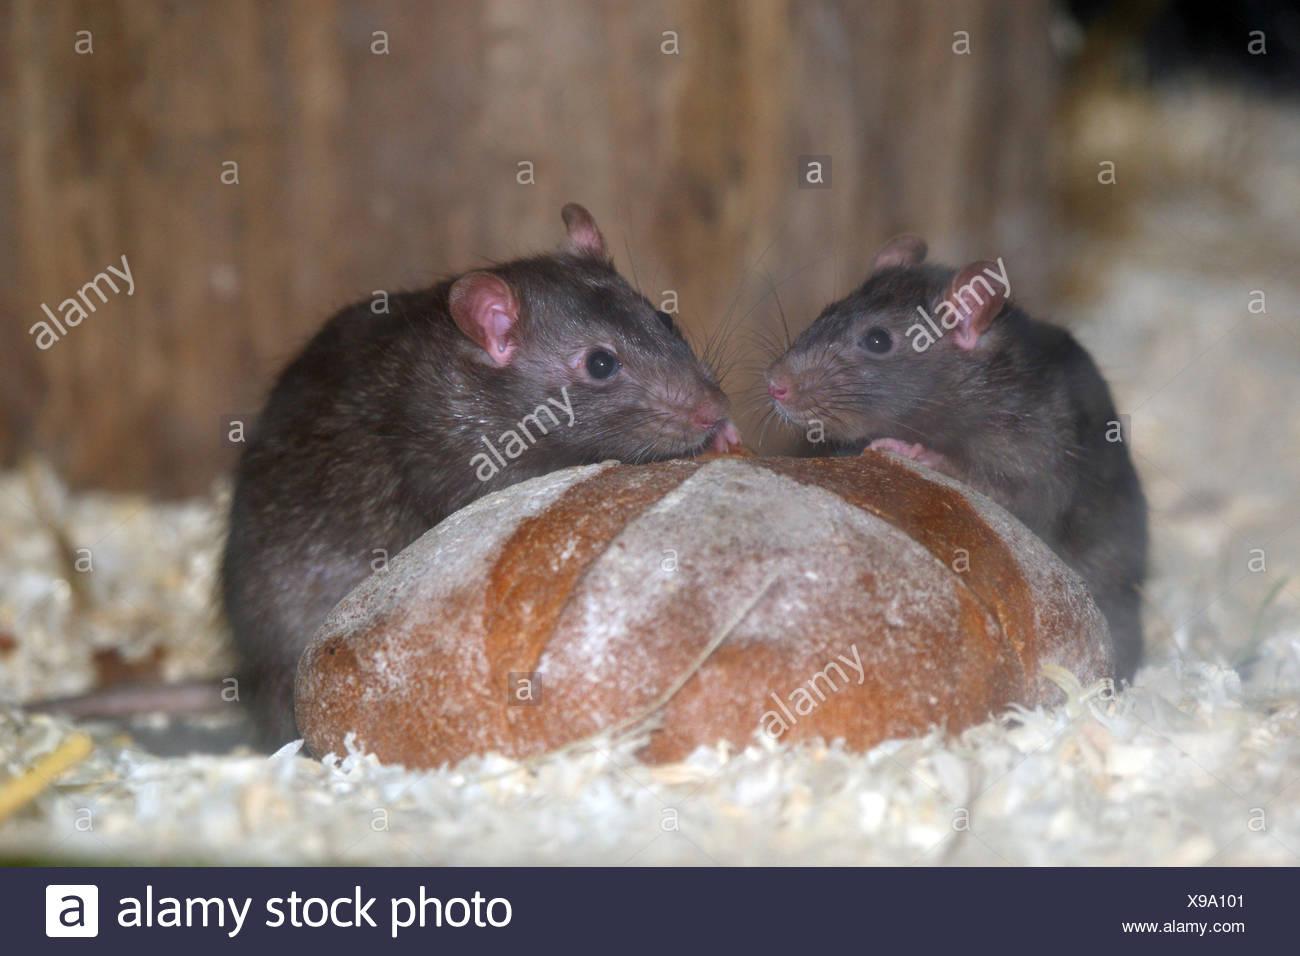 Schwarzen Ratten, Brot zu essen, Stockbild